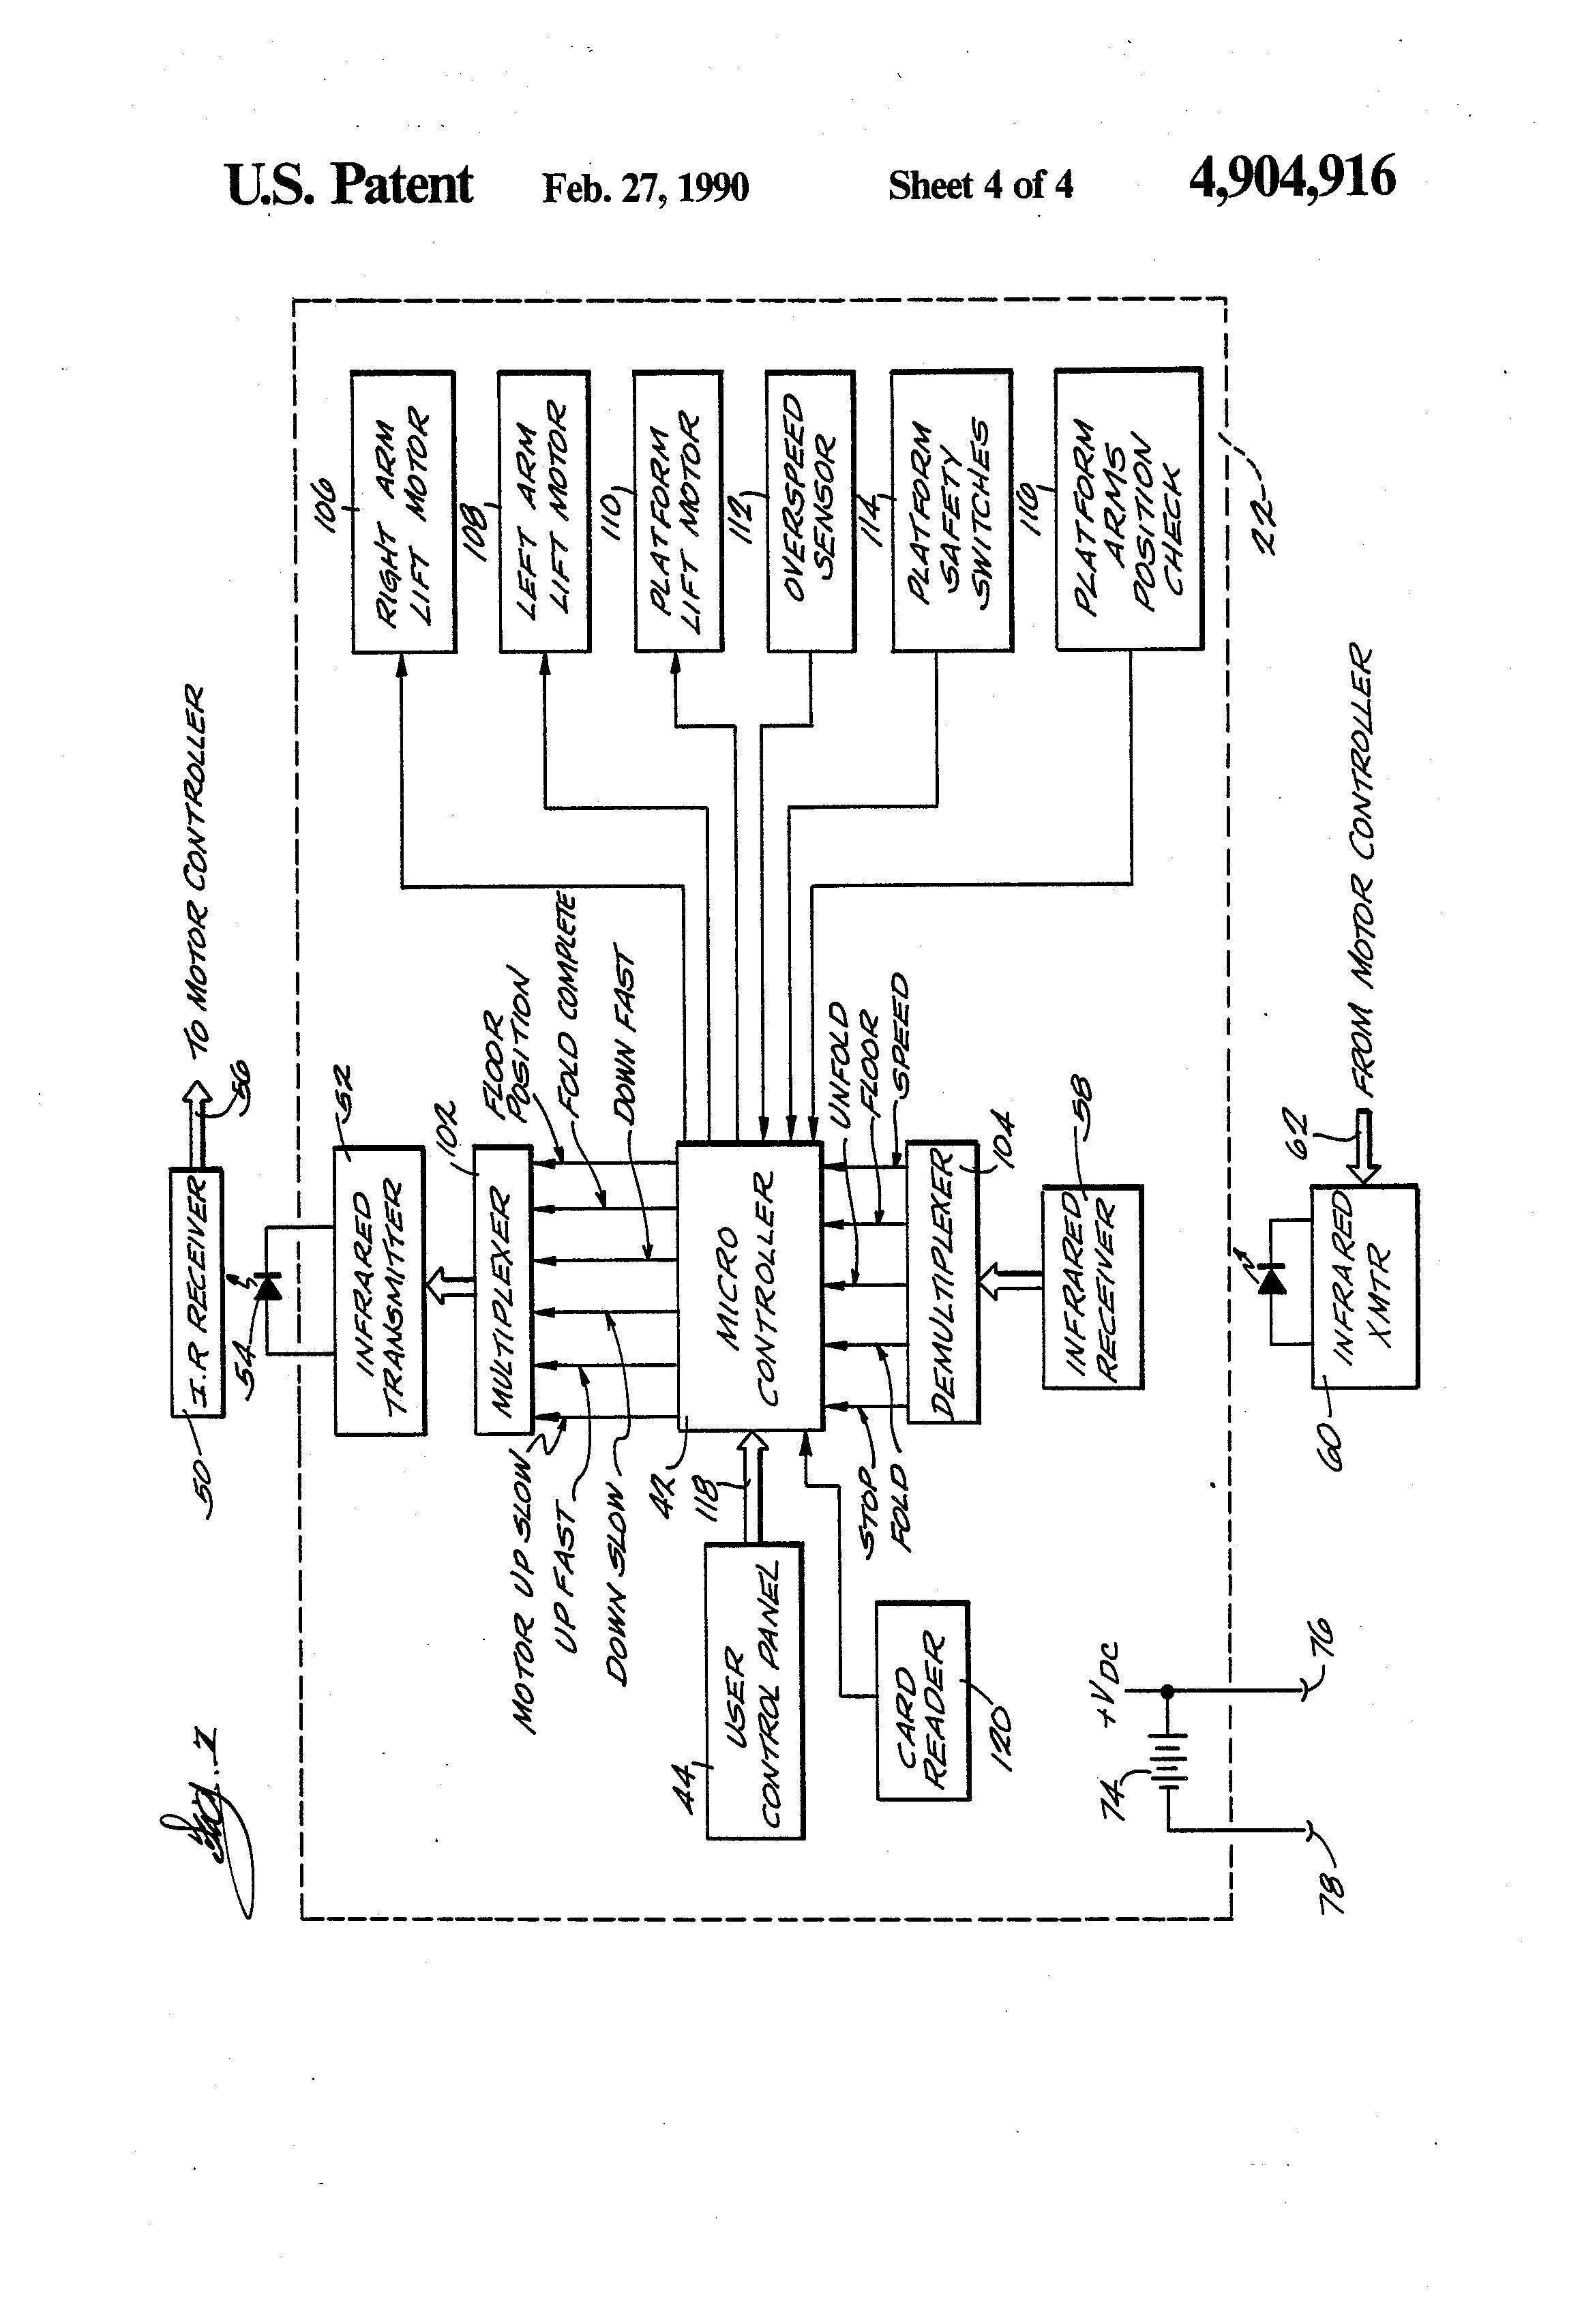 Wiring Diagram Avanza Vvti Unique 20p Wiring Diagram In 2020 Diagram Line Diagram Automatic Gate